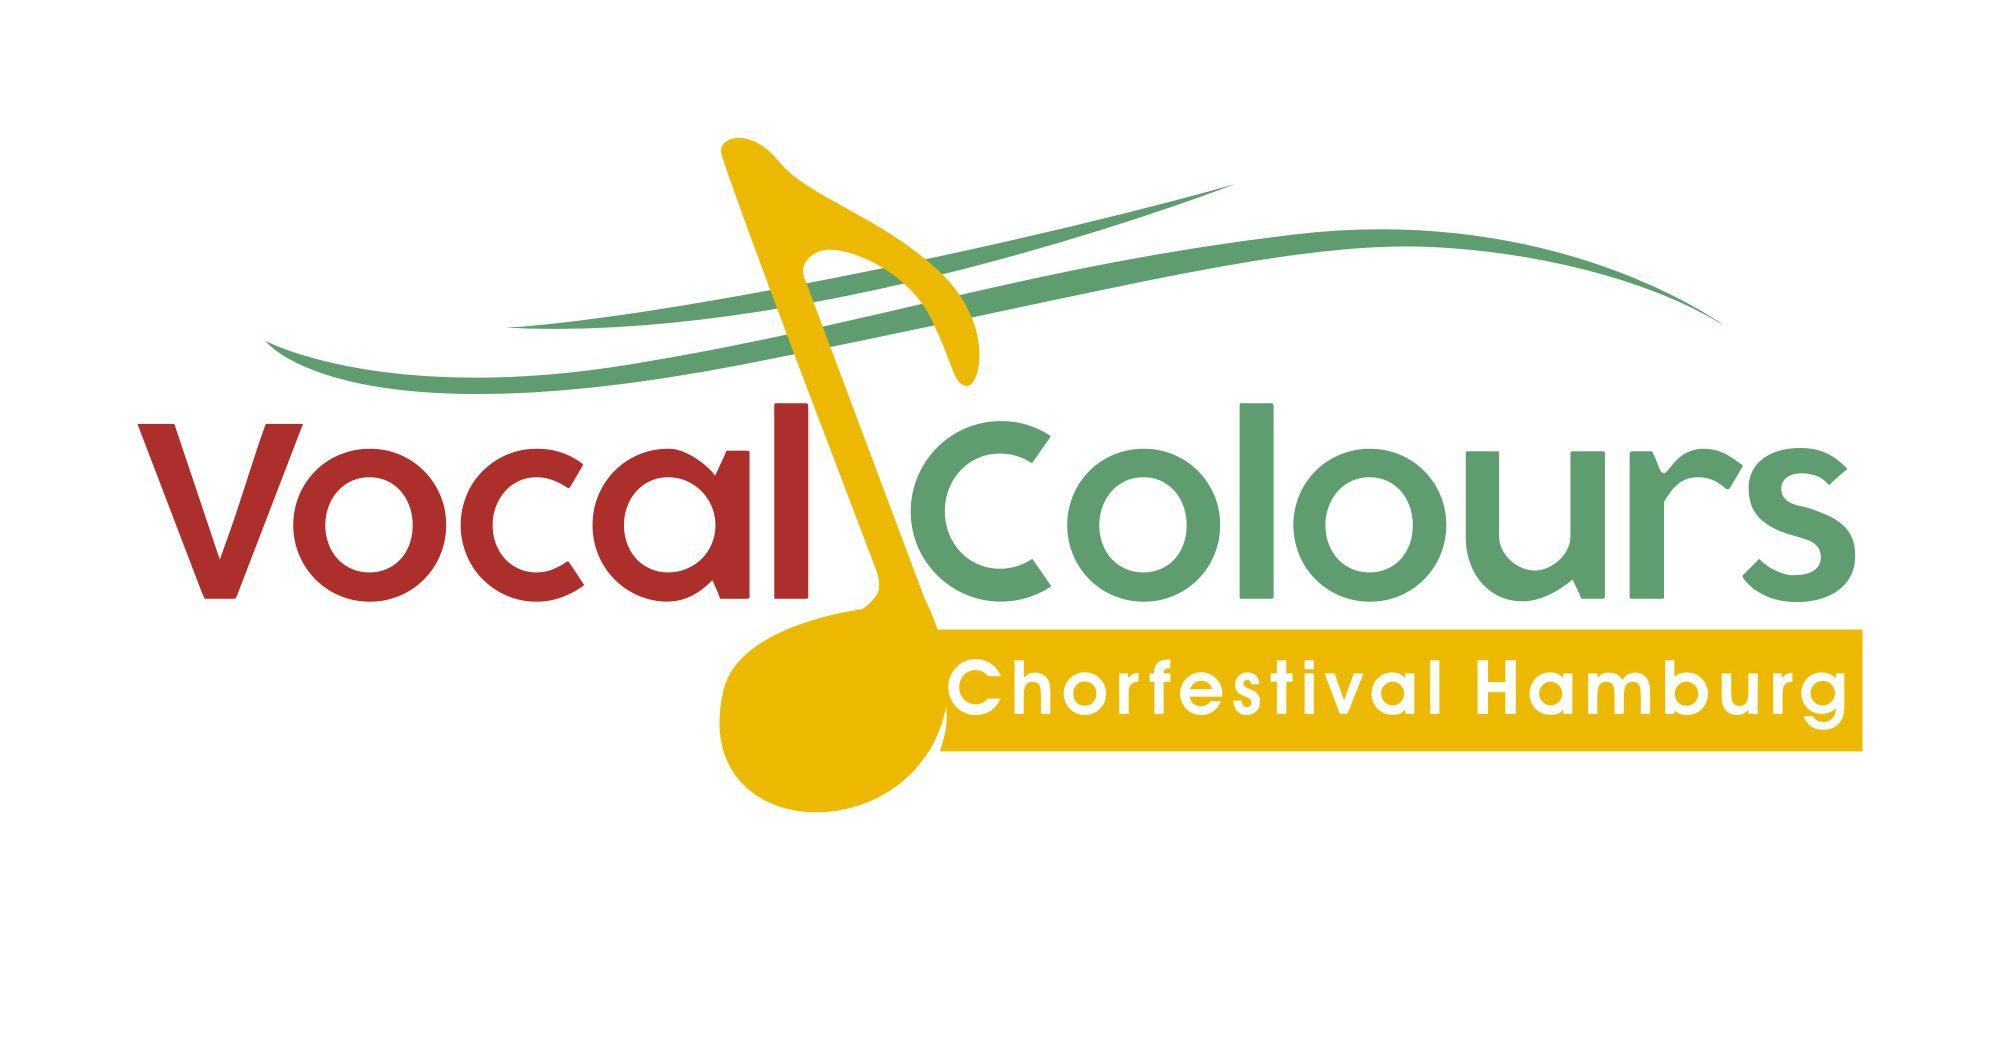 Vocal Colours Chorfestival